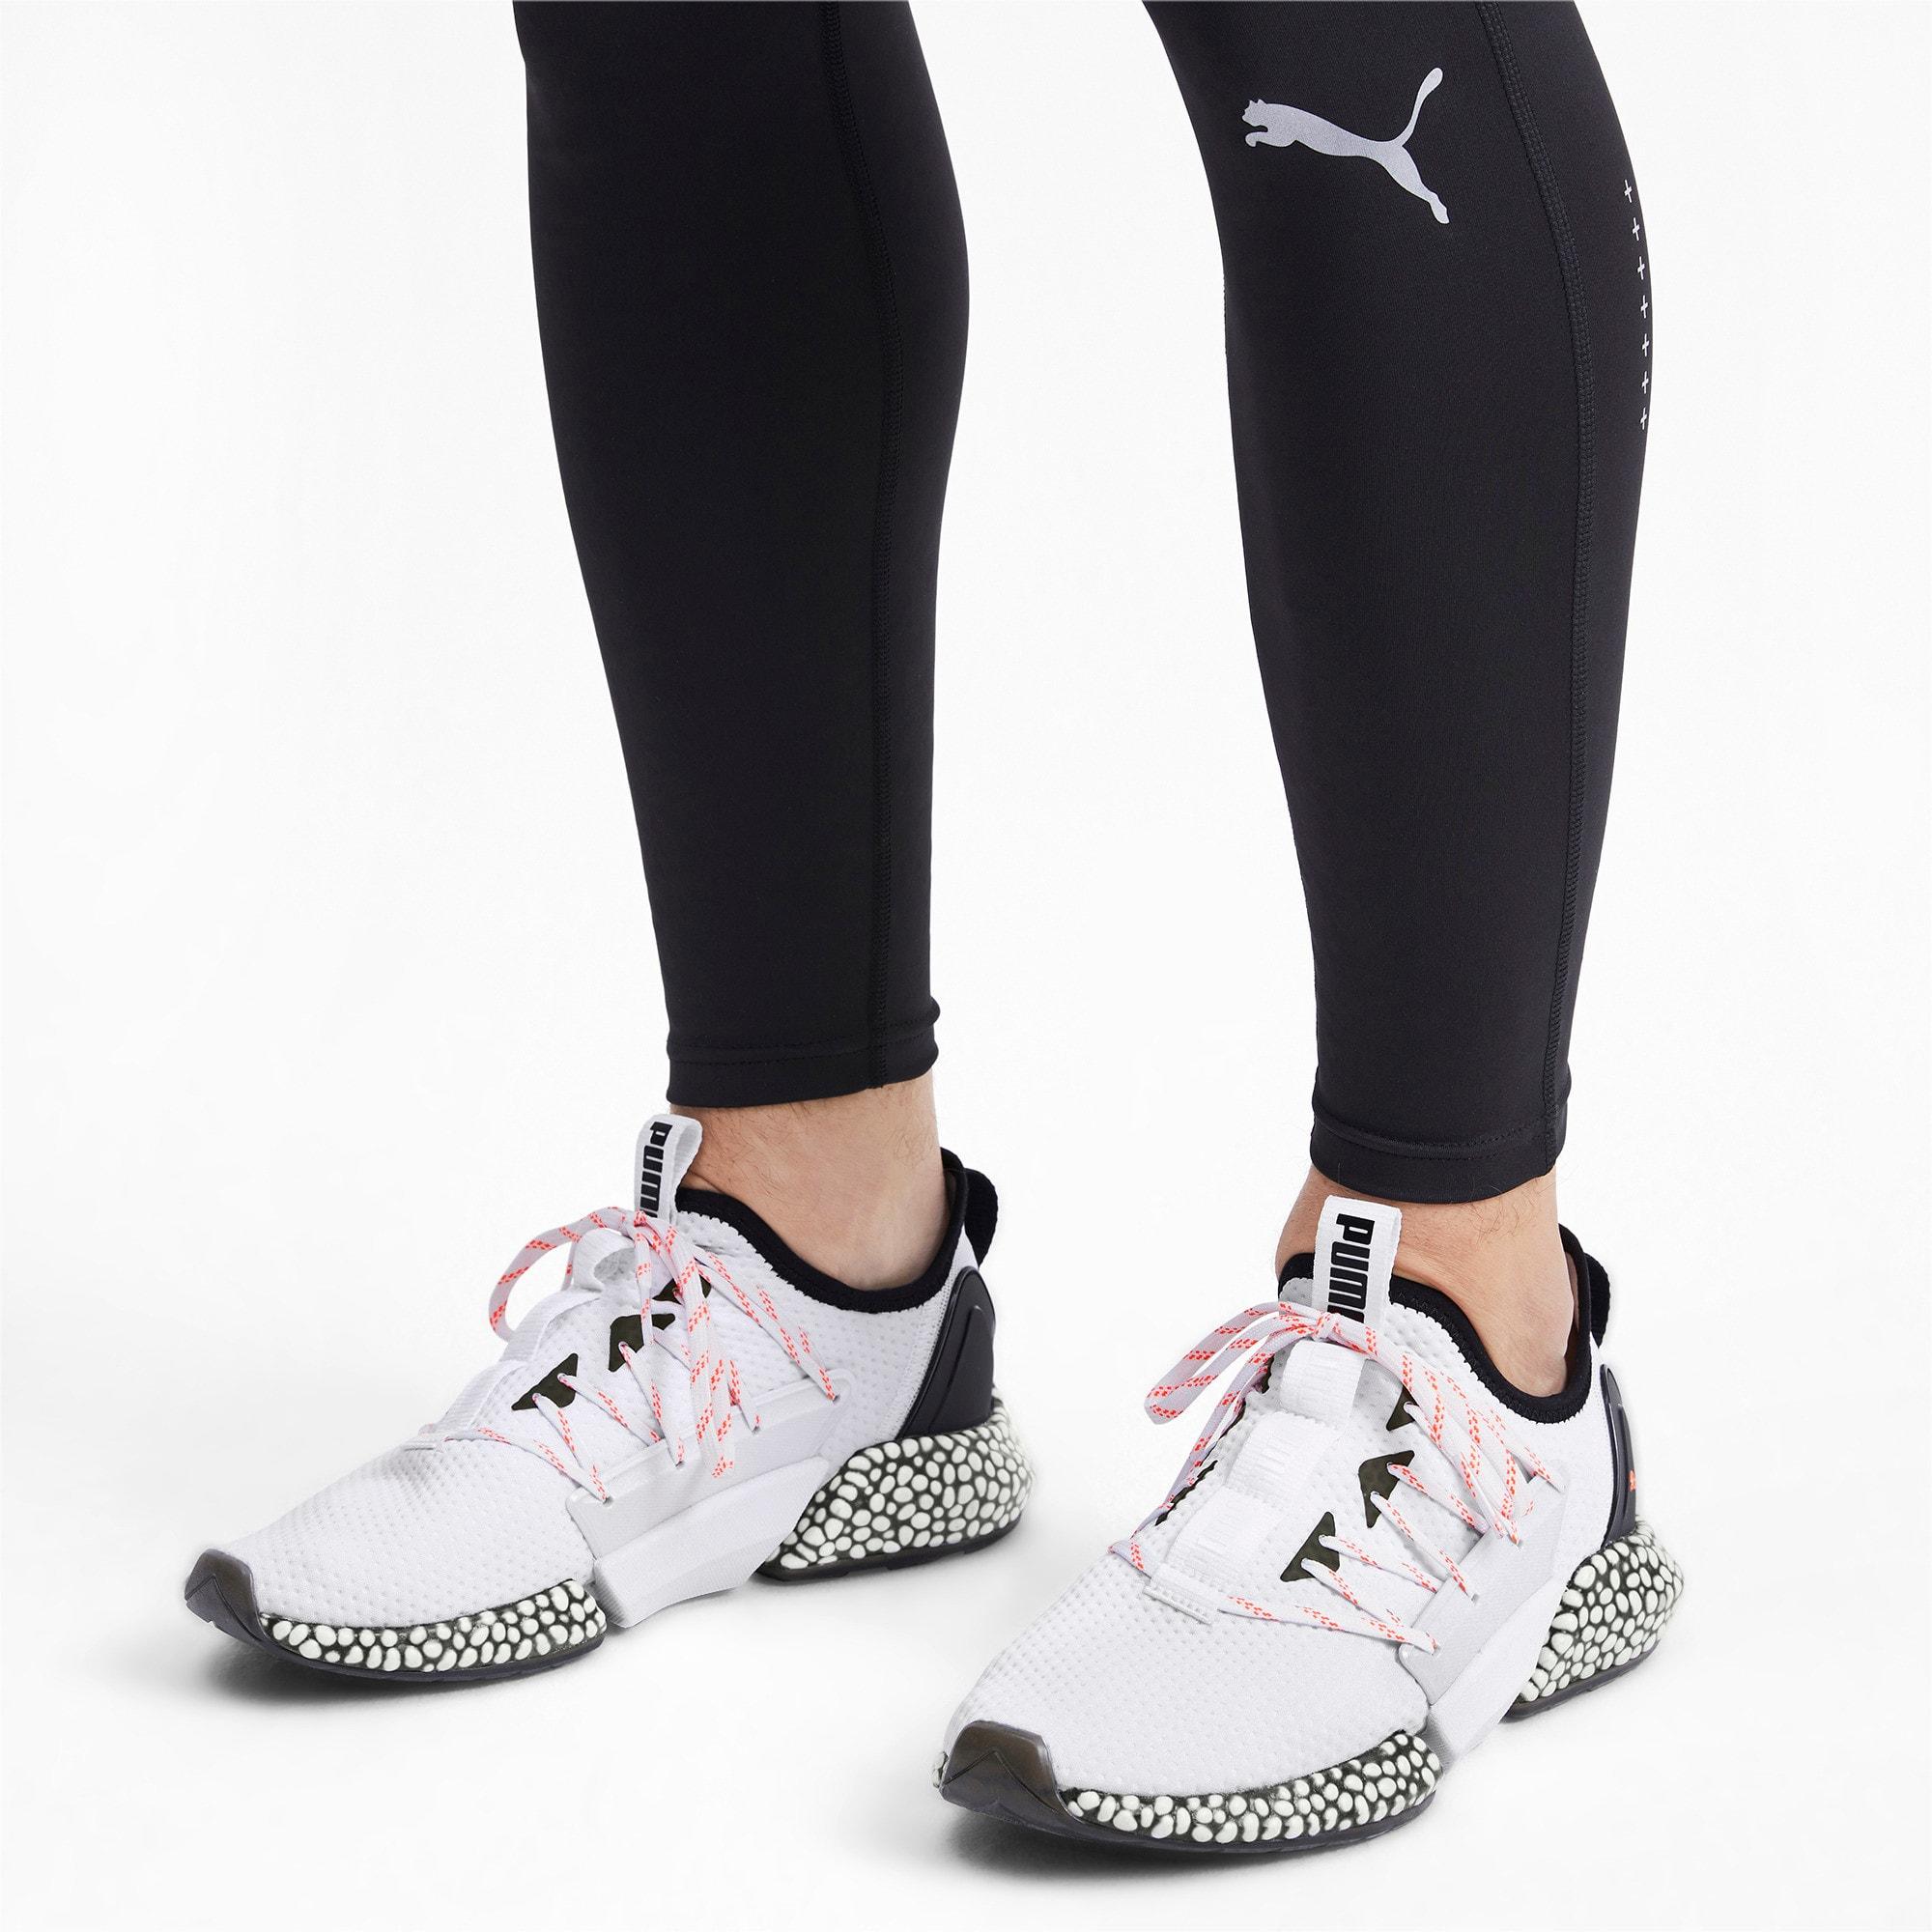 Thumbnail 2 of HYBRID Rocket Aero Men's Running Shoes, Puma White-Puma Black, medium